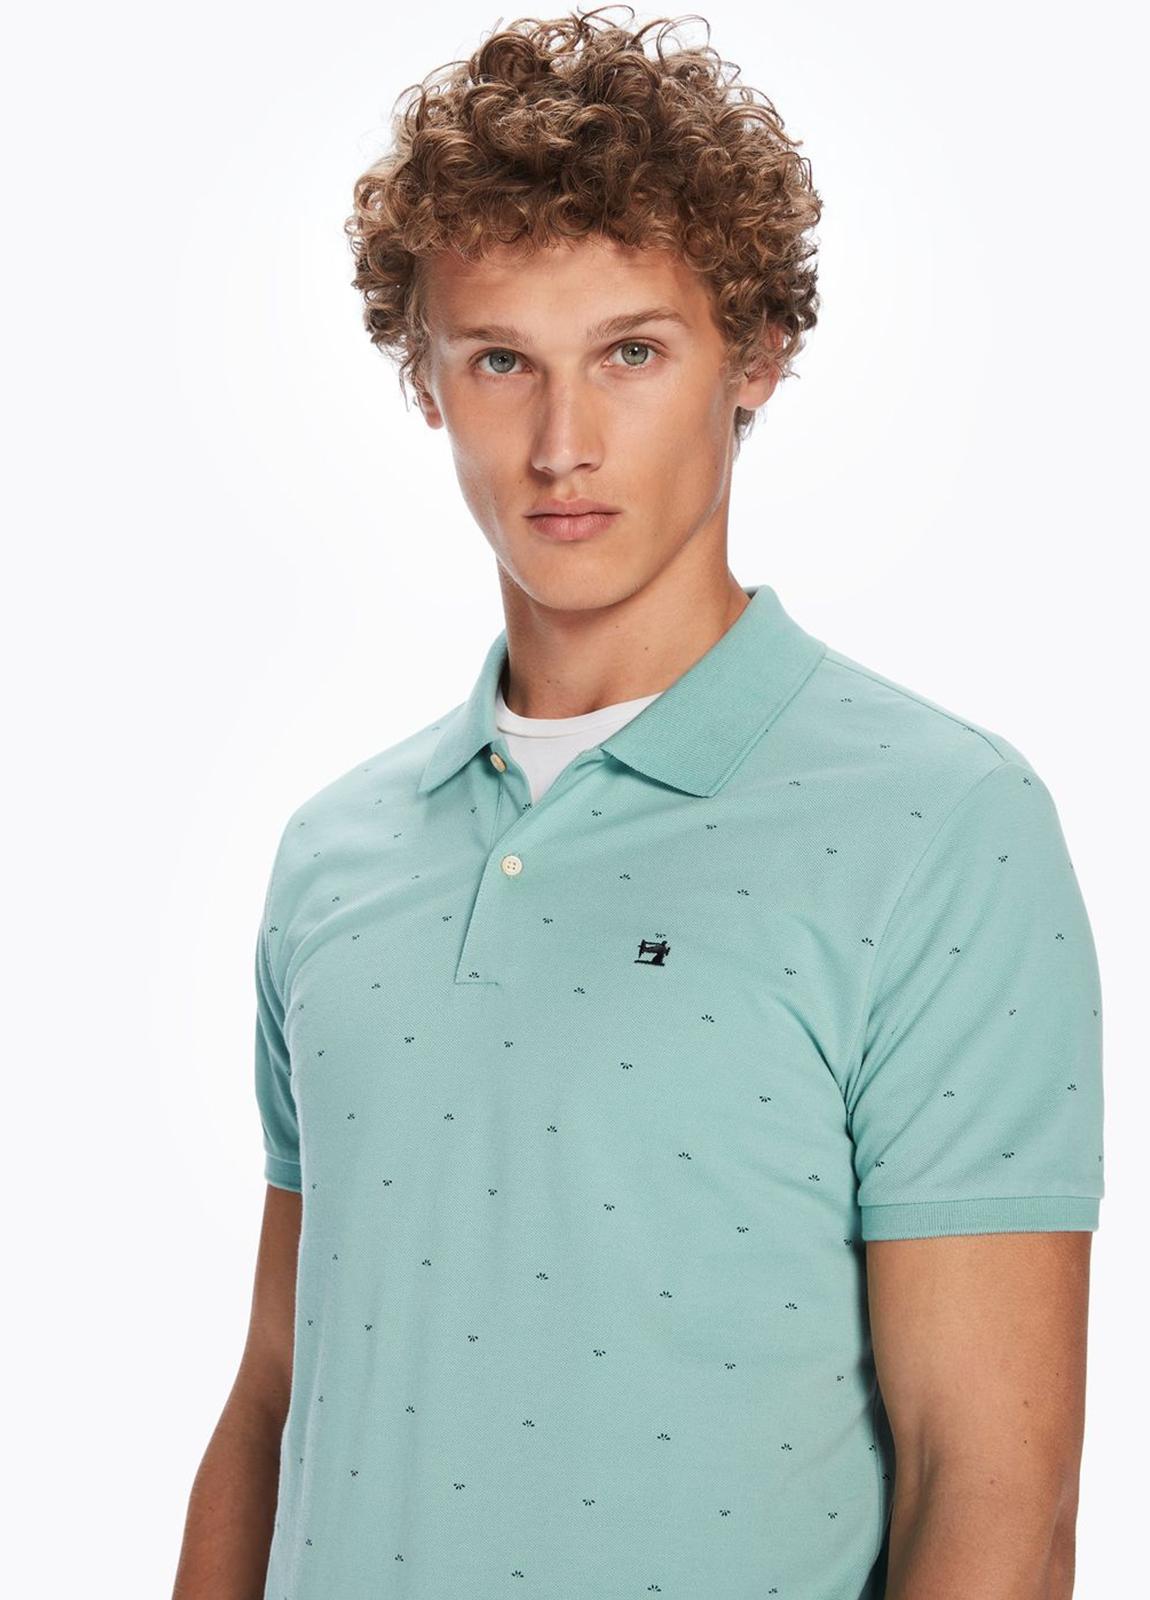 Polo manga corta de piqué color verde con motivos estampados. 100% algodón.